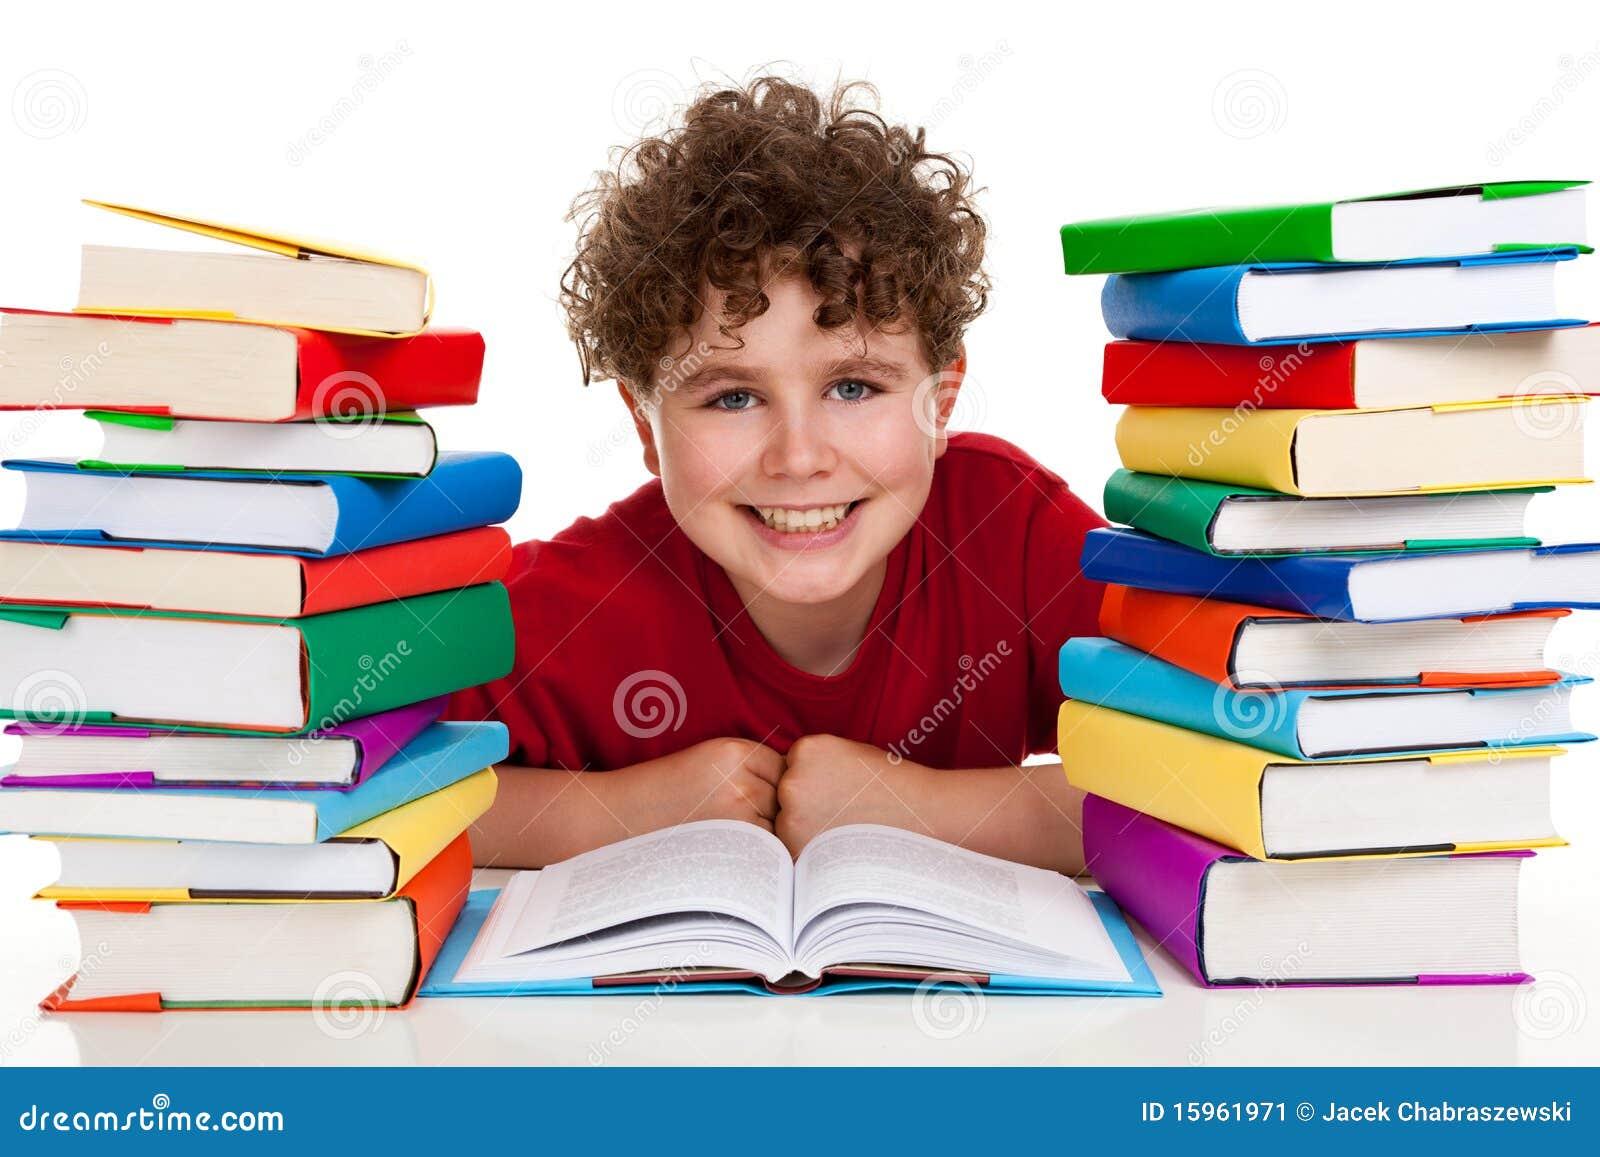 Time for kid homework helper